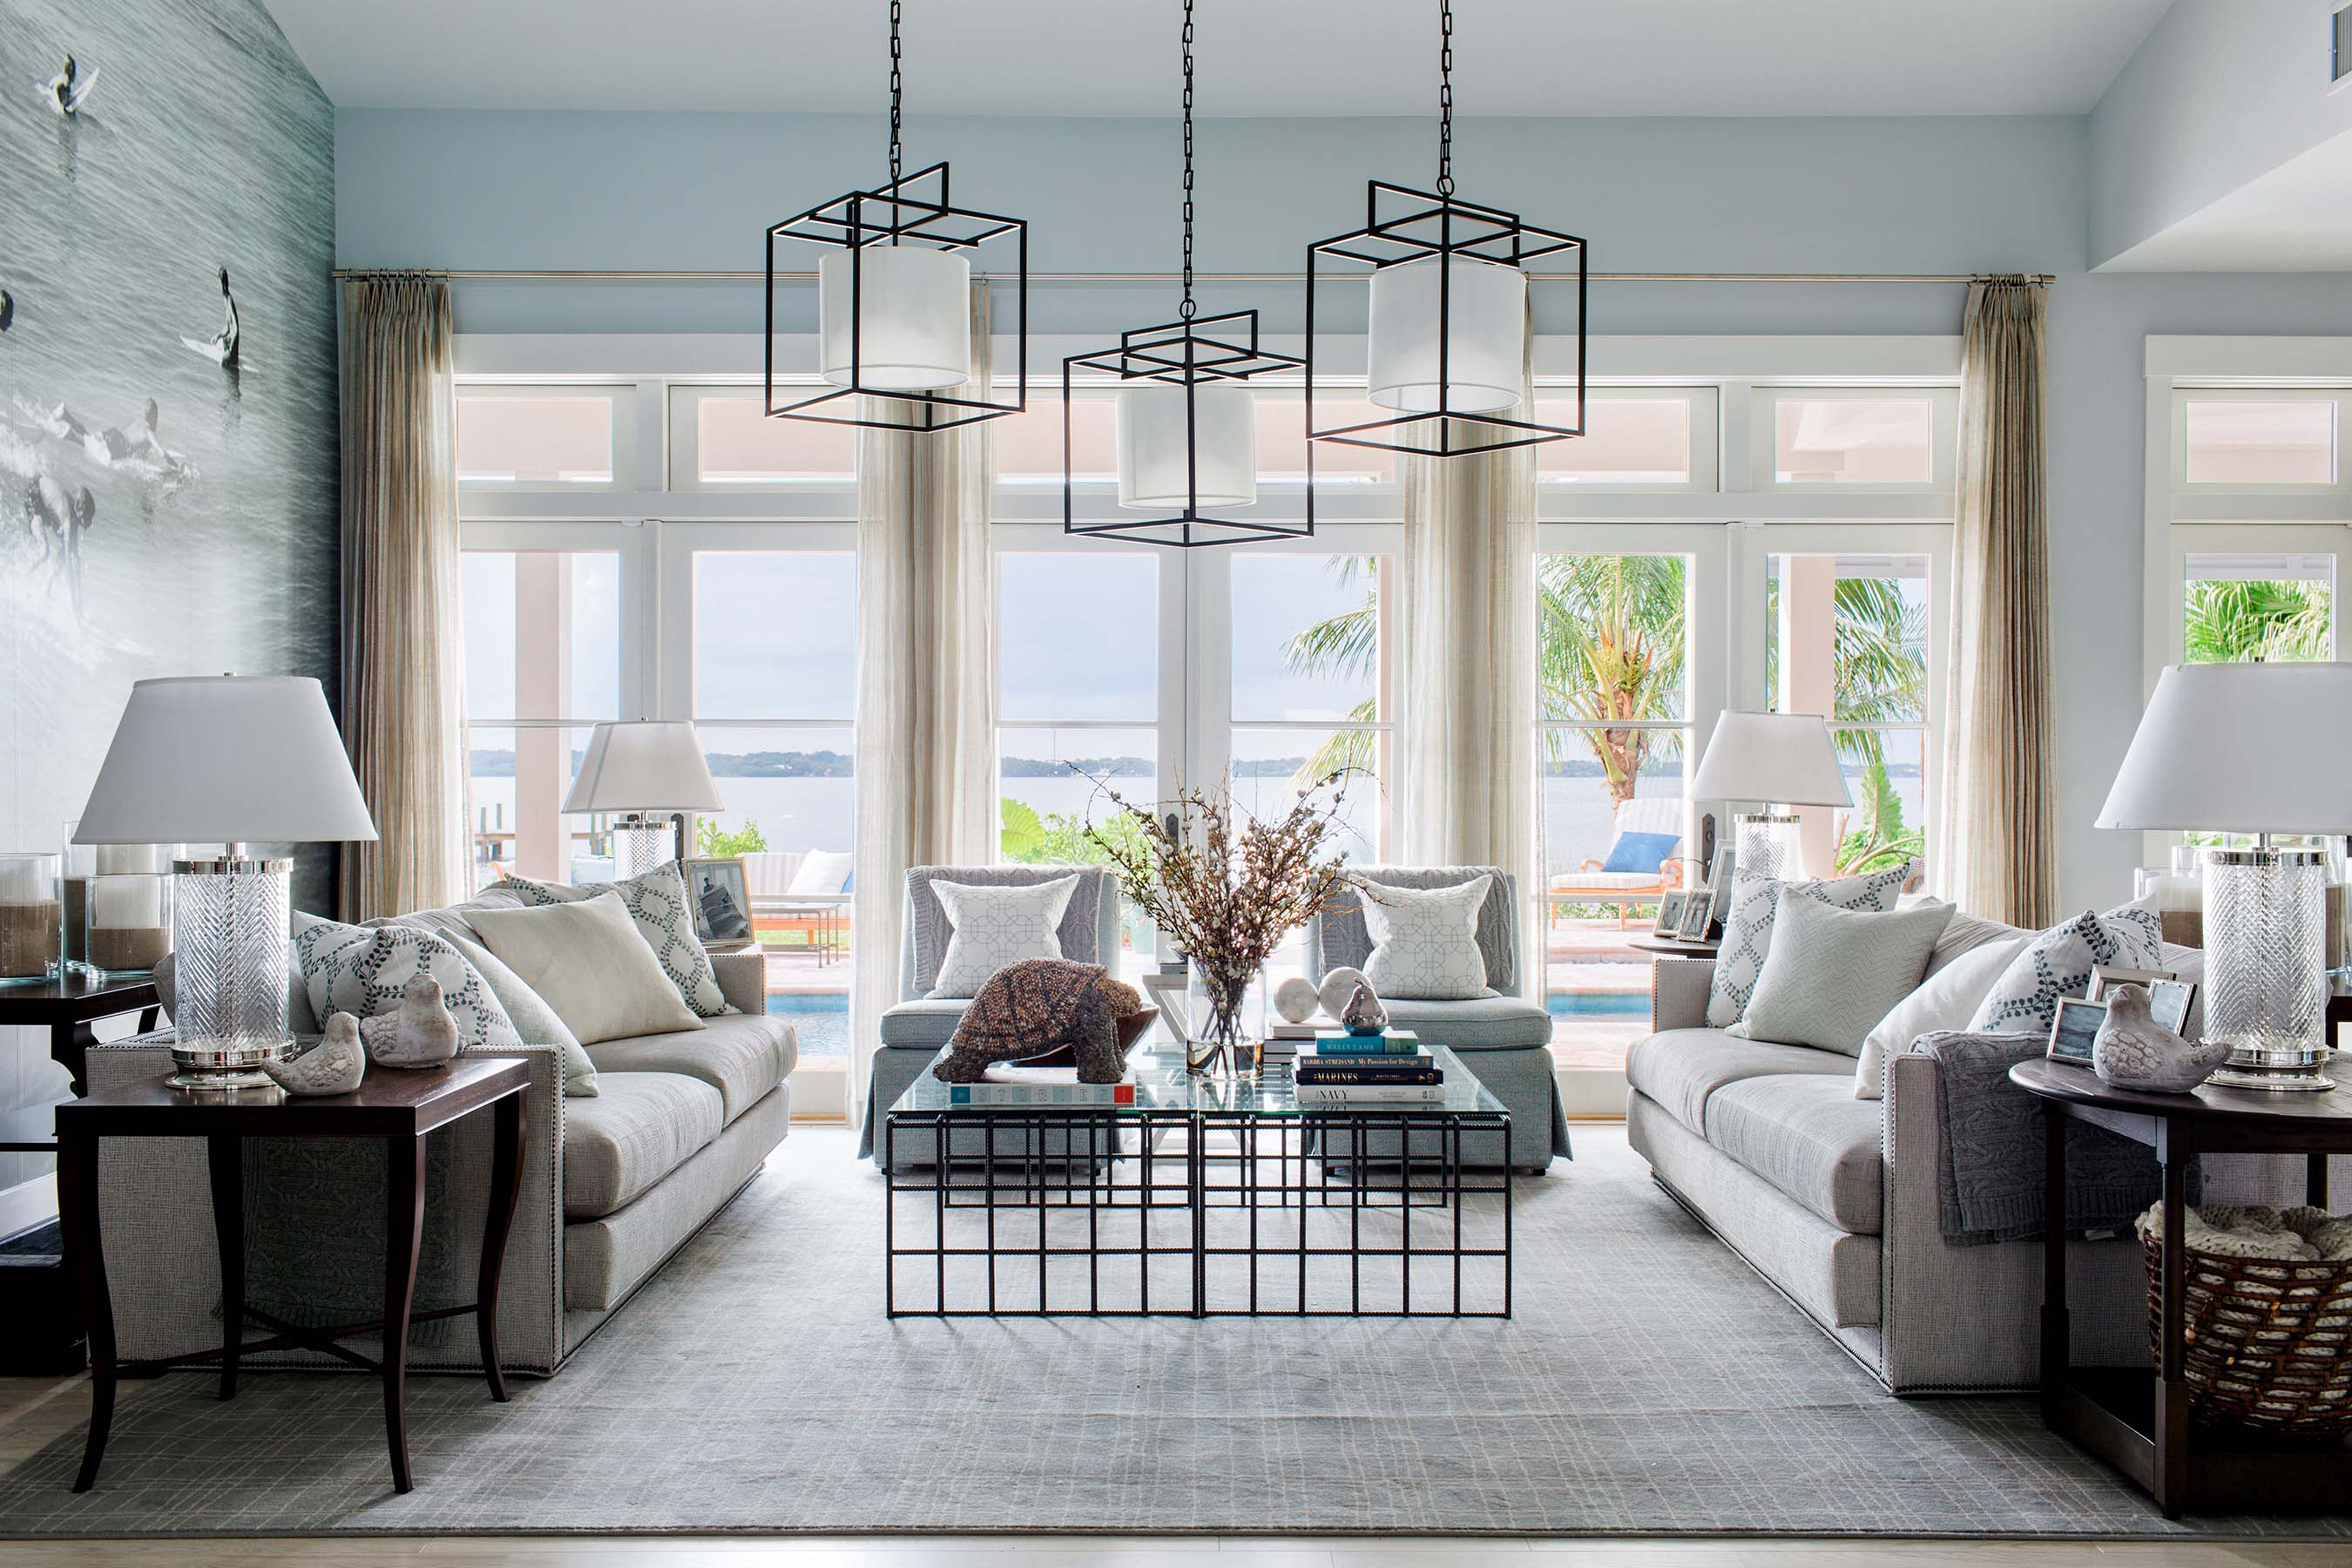 Joyous Hgtv Dream Coastal Style Get This Coastal Elegance Hgtv Dream Home Realtor Hgtv 2017 Dream Home S Hgtv 2017 Dream Home Paint Colors curbed Hgtv 2017 Dream Home